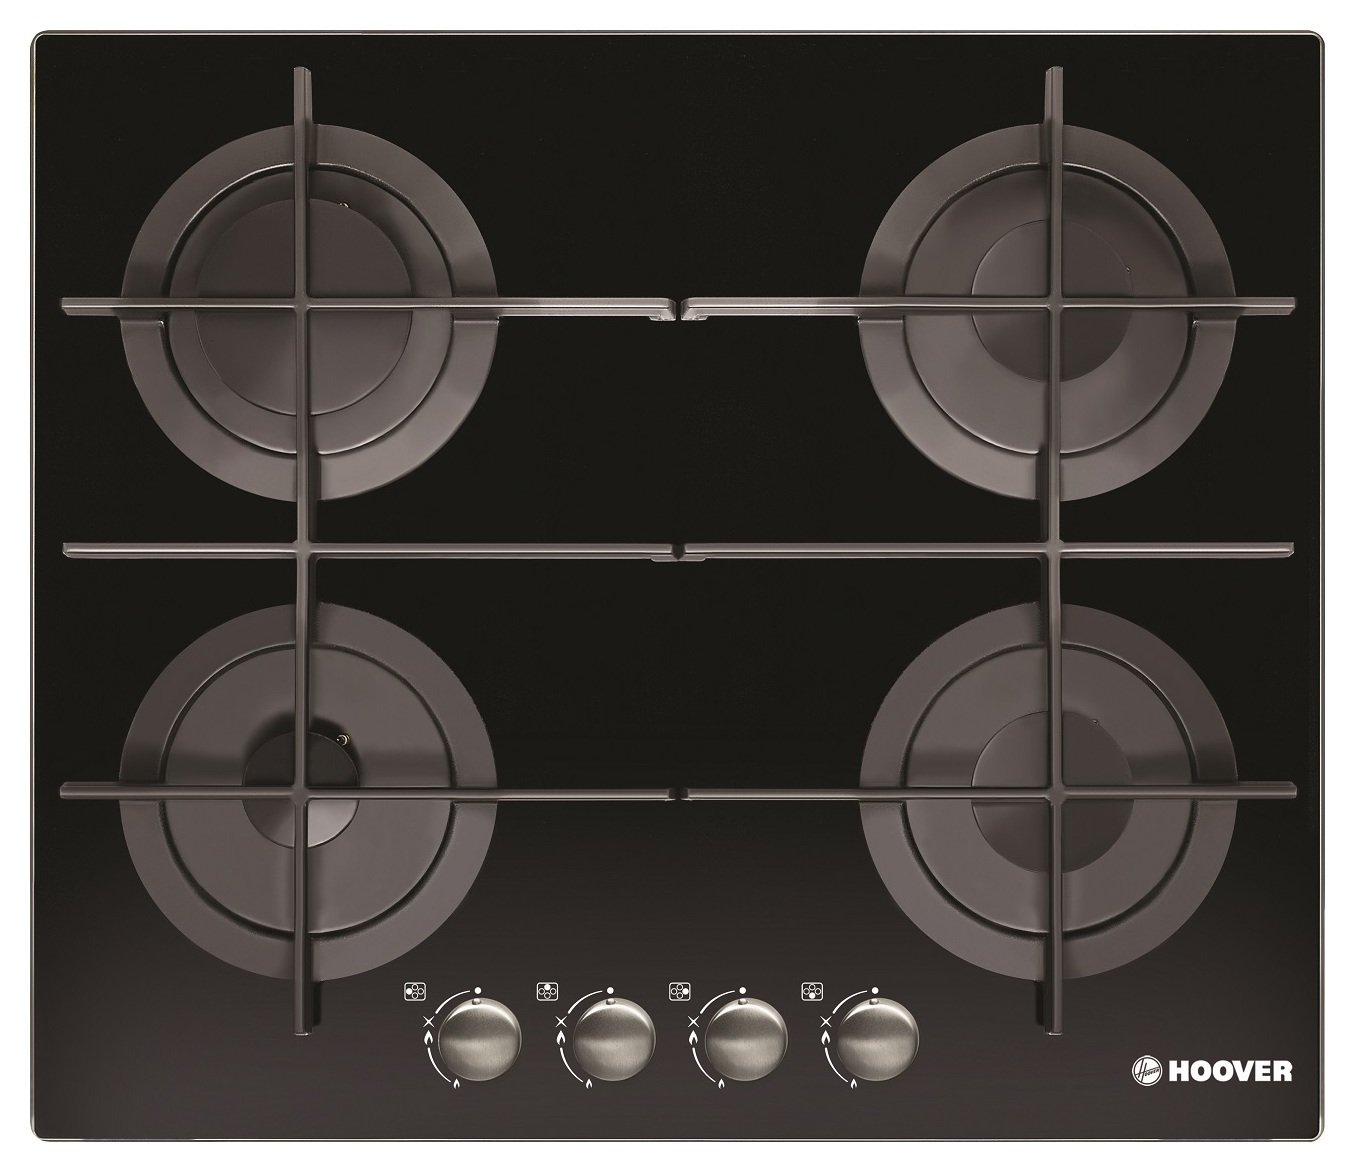 Image of Hoover HGV64STCGB Gas Hob - Black